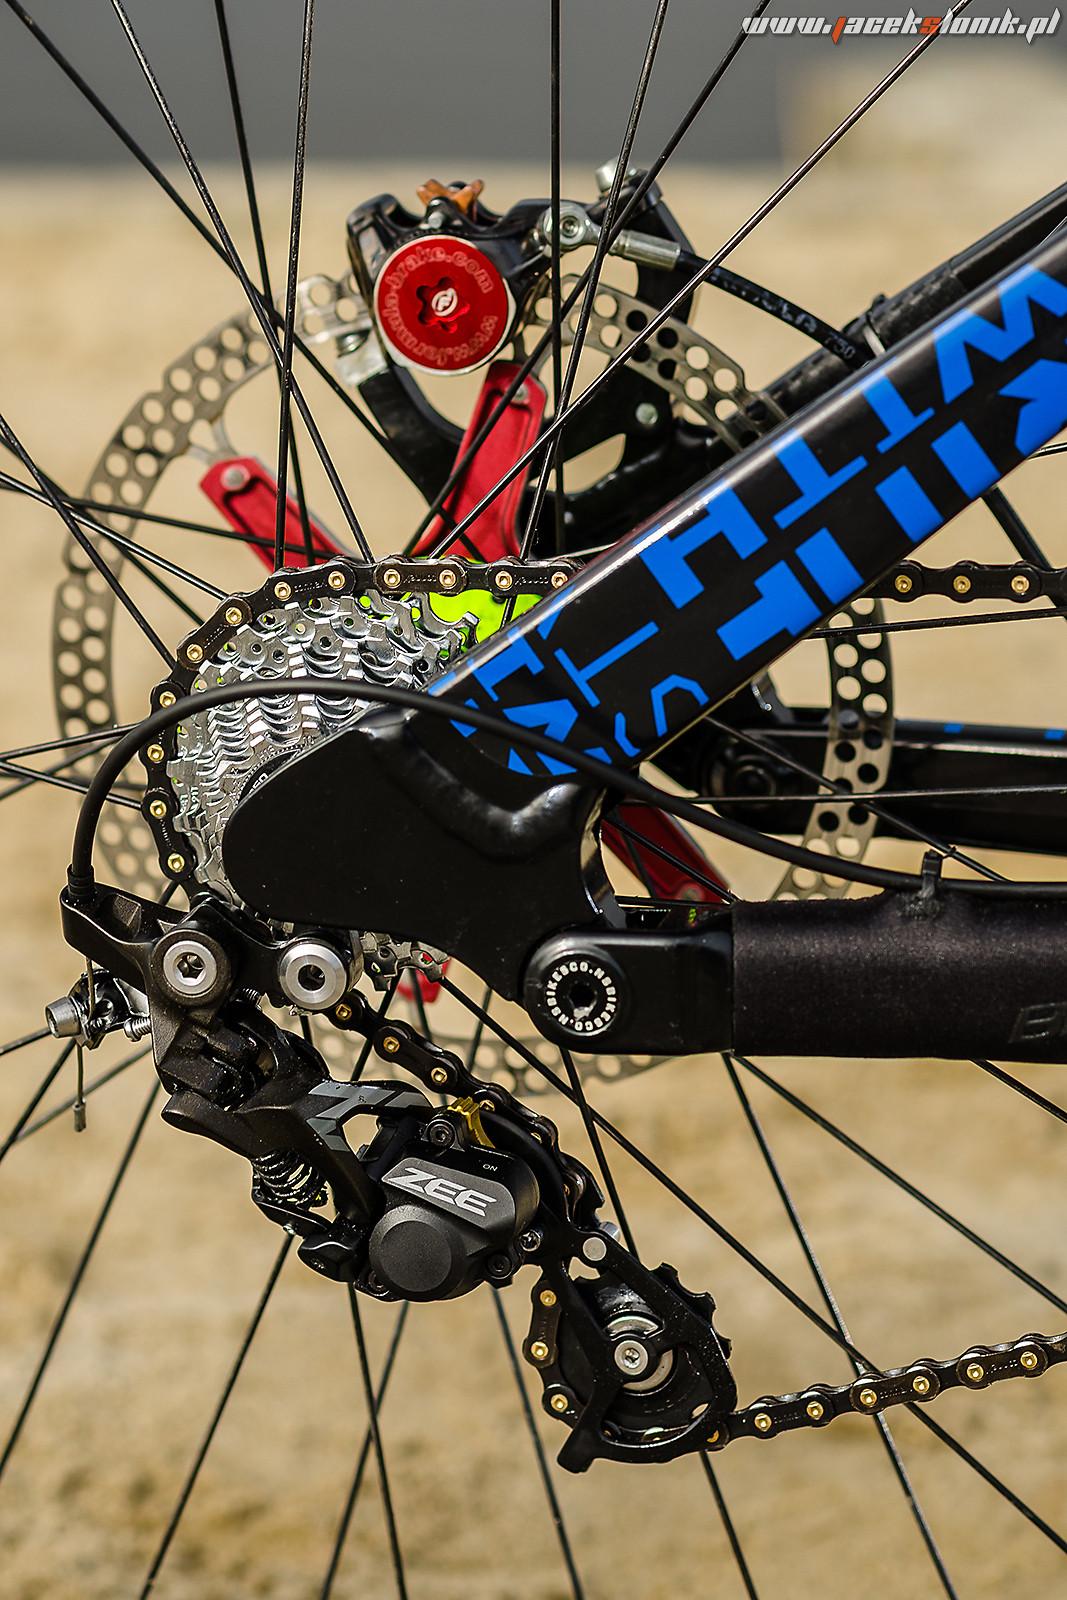 ab49b4b1fa7 NS Bikes Fuzz 2015 - JacekSlonik's Bike Check - Vital MTB